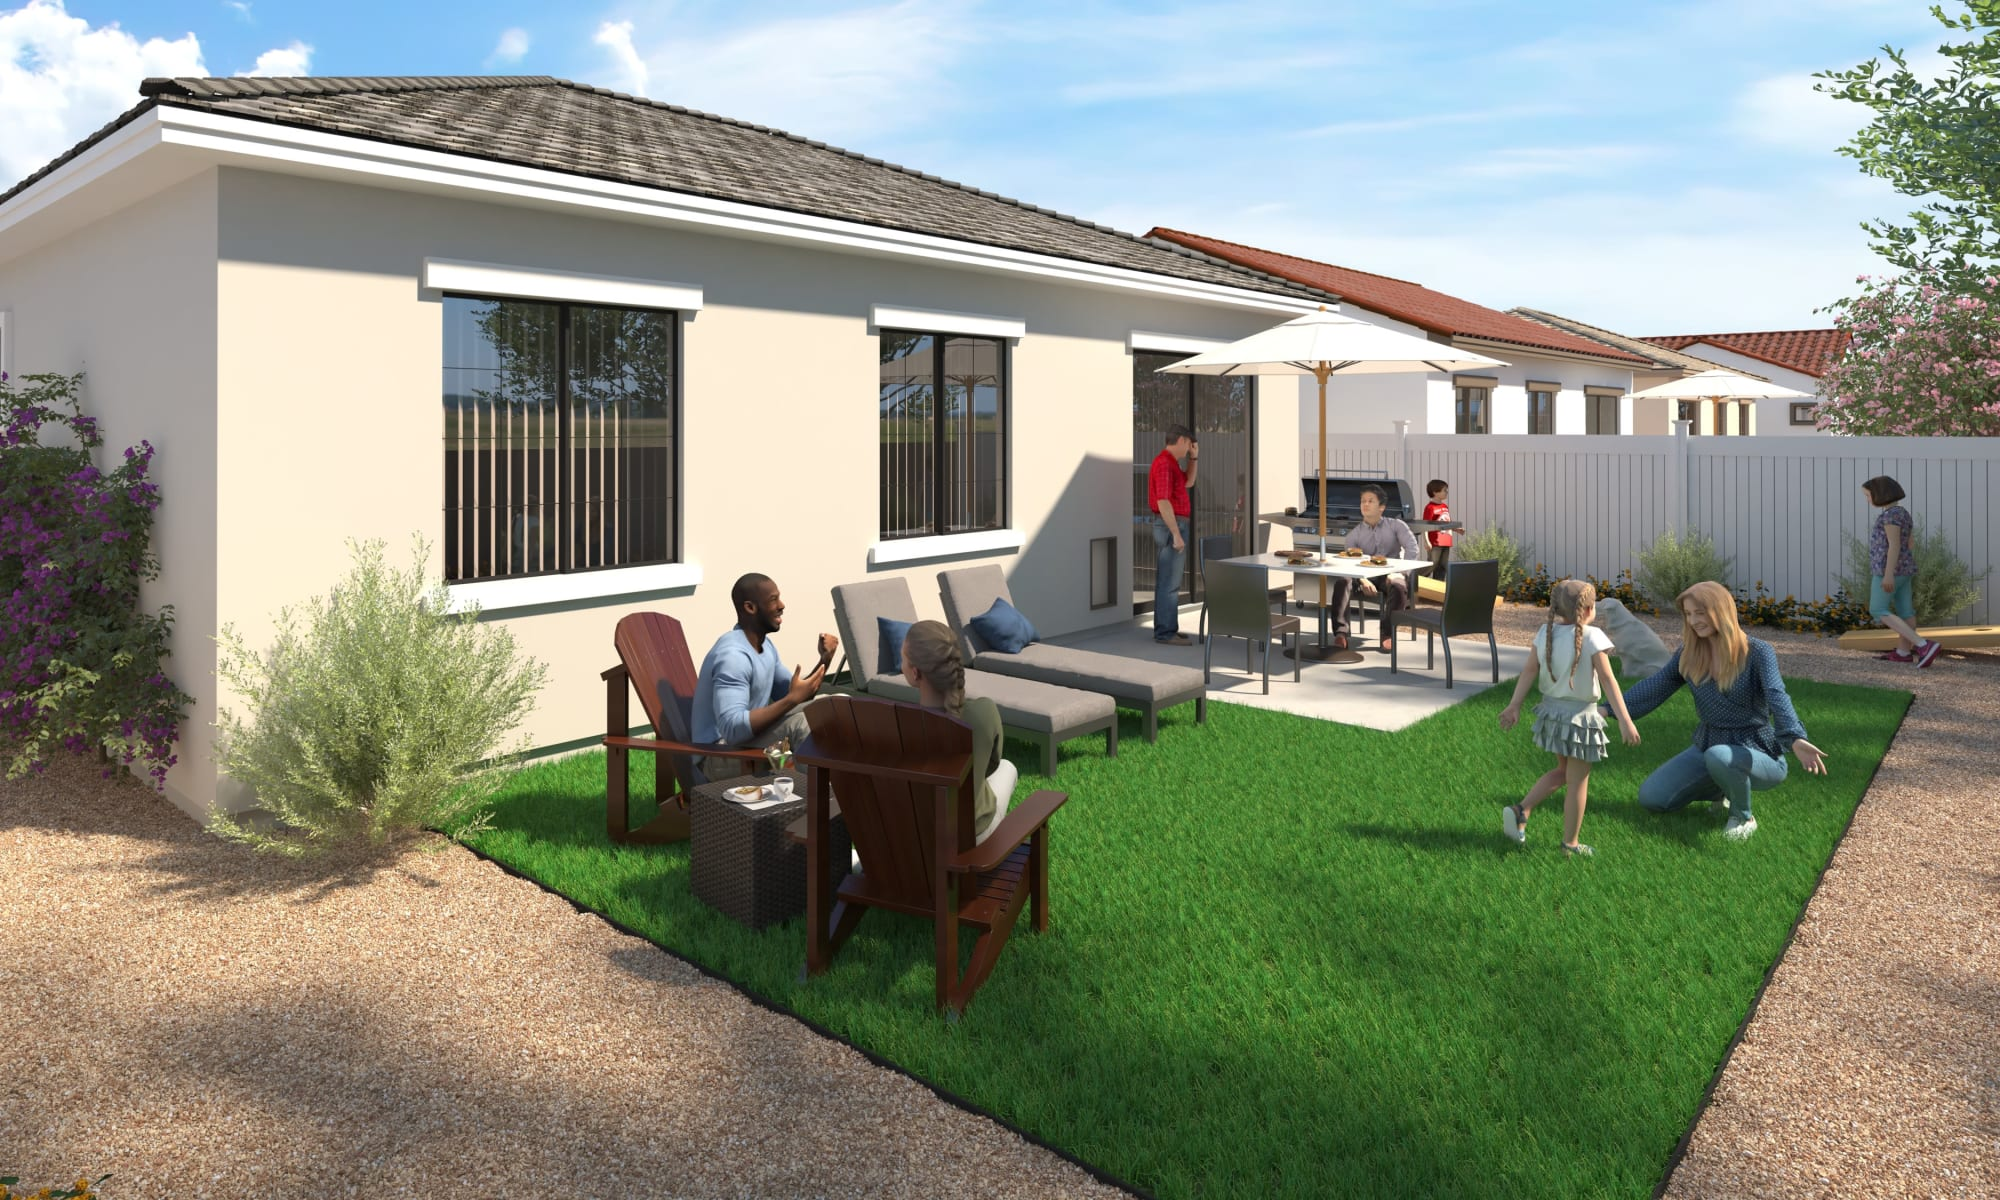 Luxury rental homes at Tavalo at Cadence in Mesa, Arizona